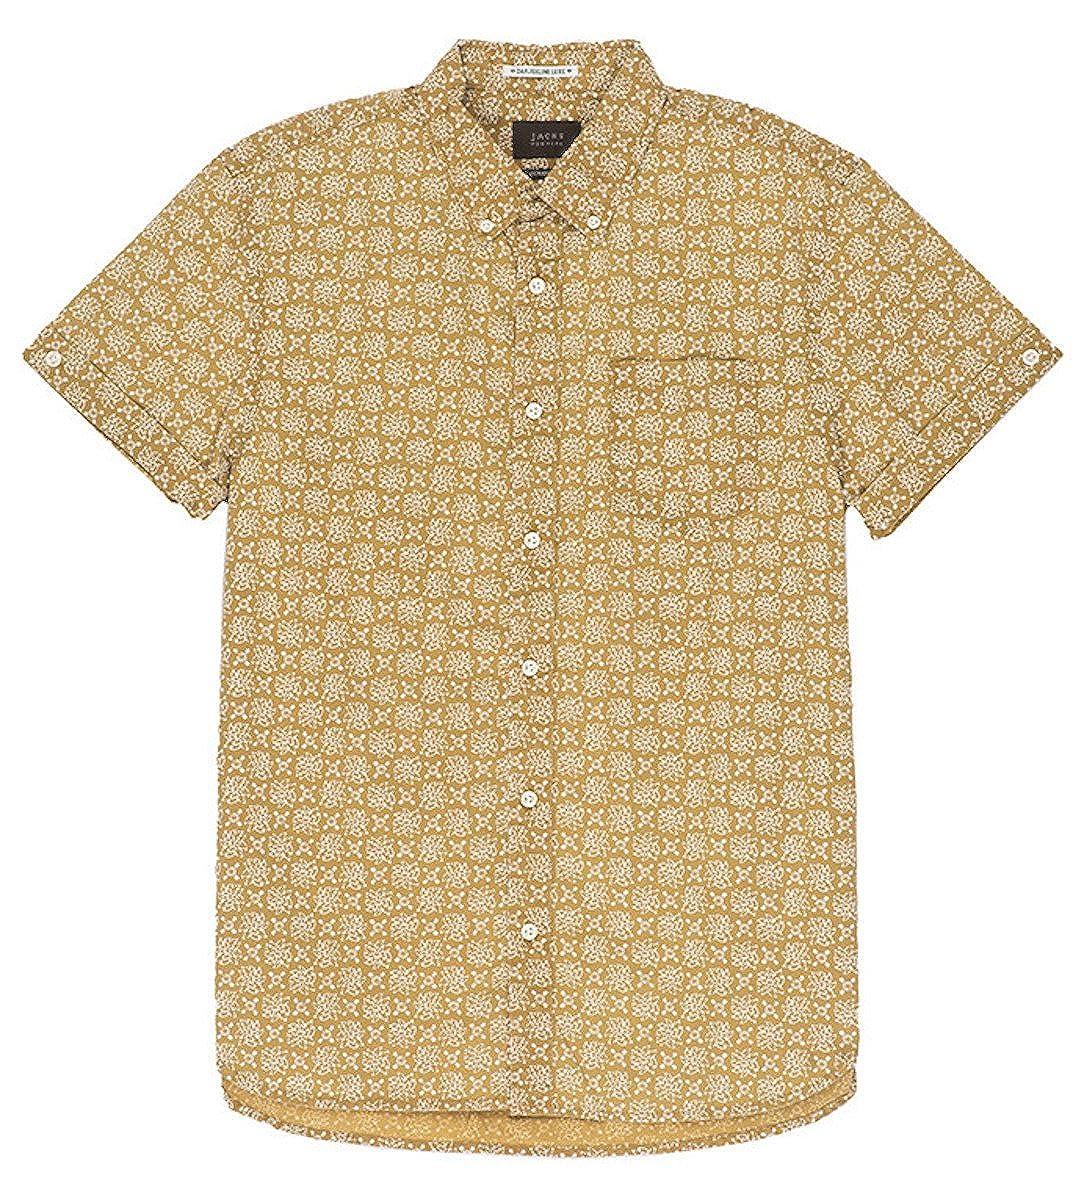 JACHS New York Mens Gold Lotus Print Short Sleeve Shirt LRG